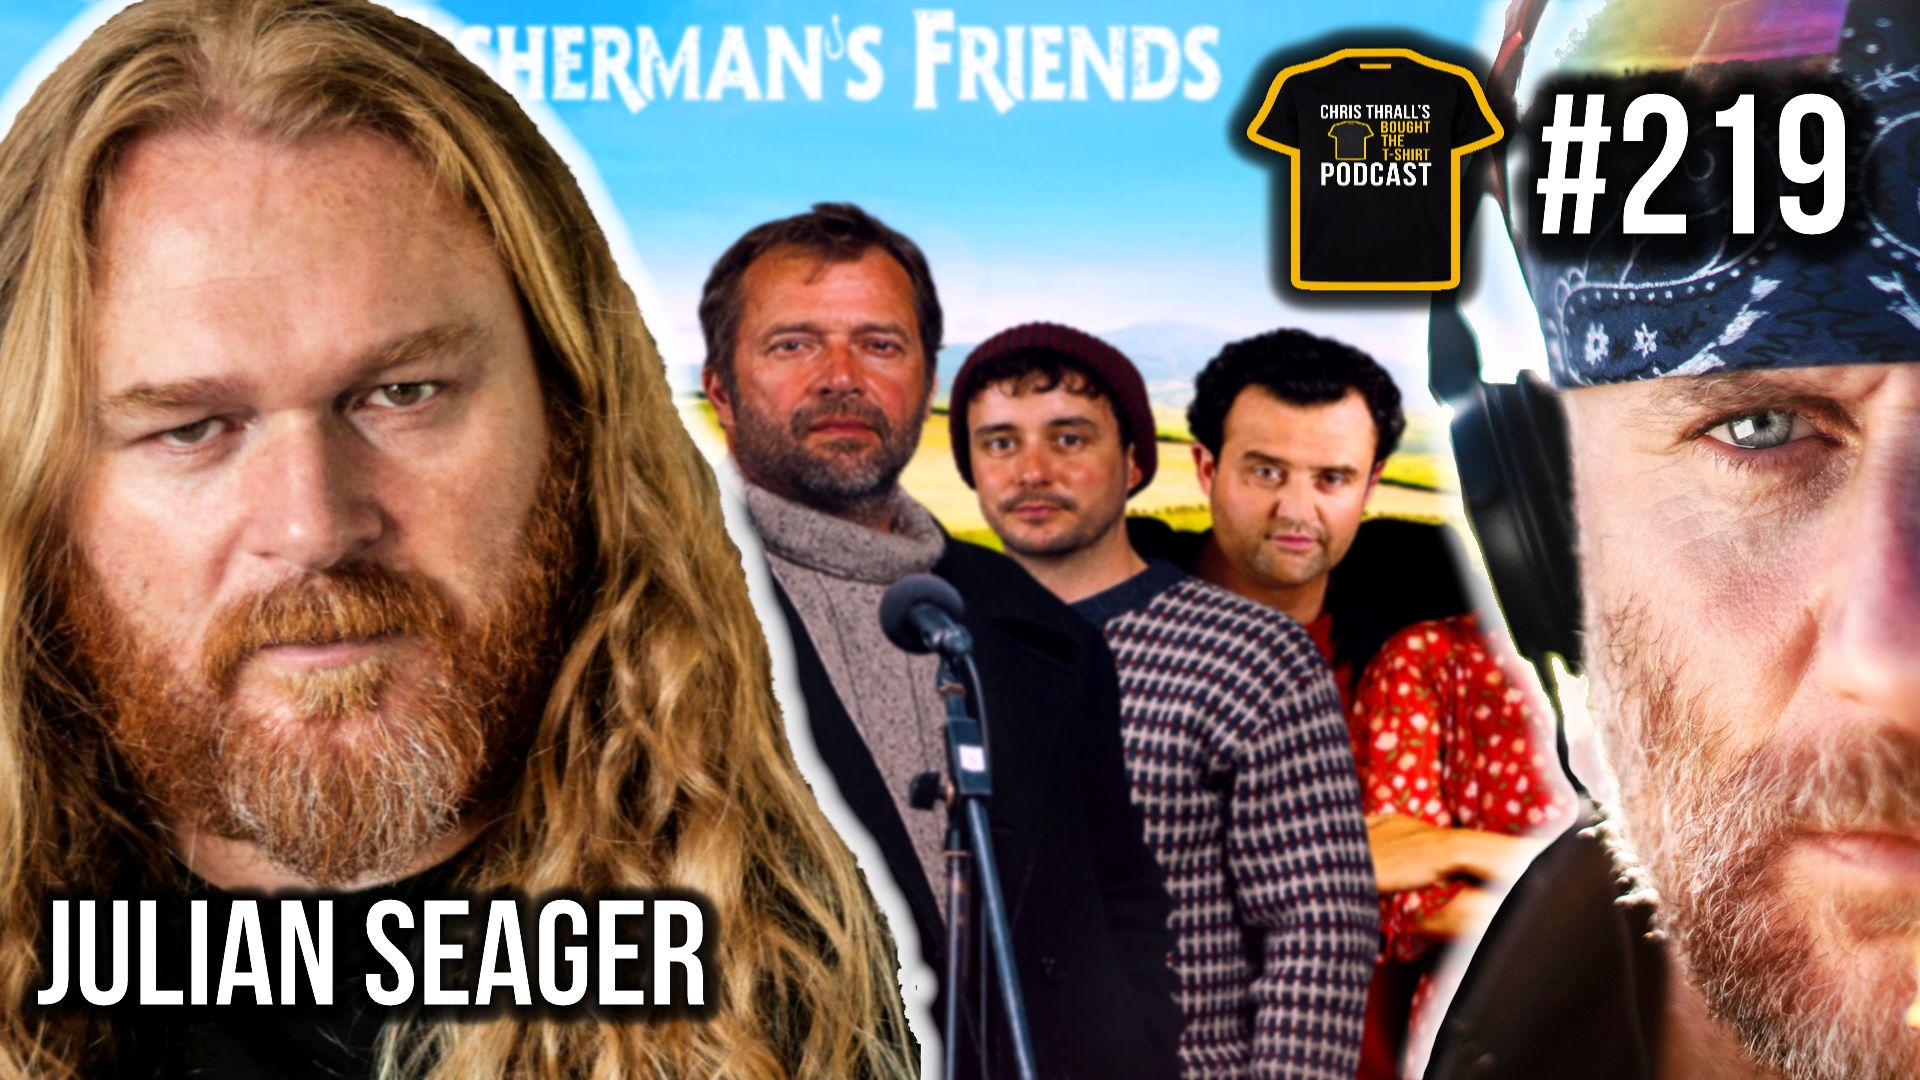 Fisherman's Friends | Doc Martin | Julian Seager | Podcast #219